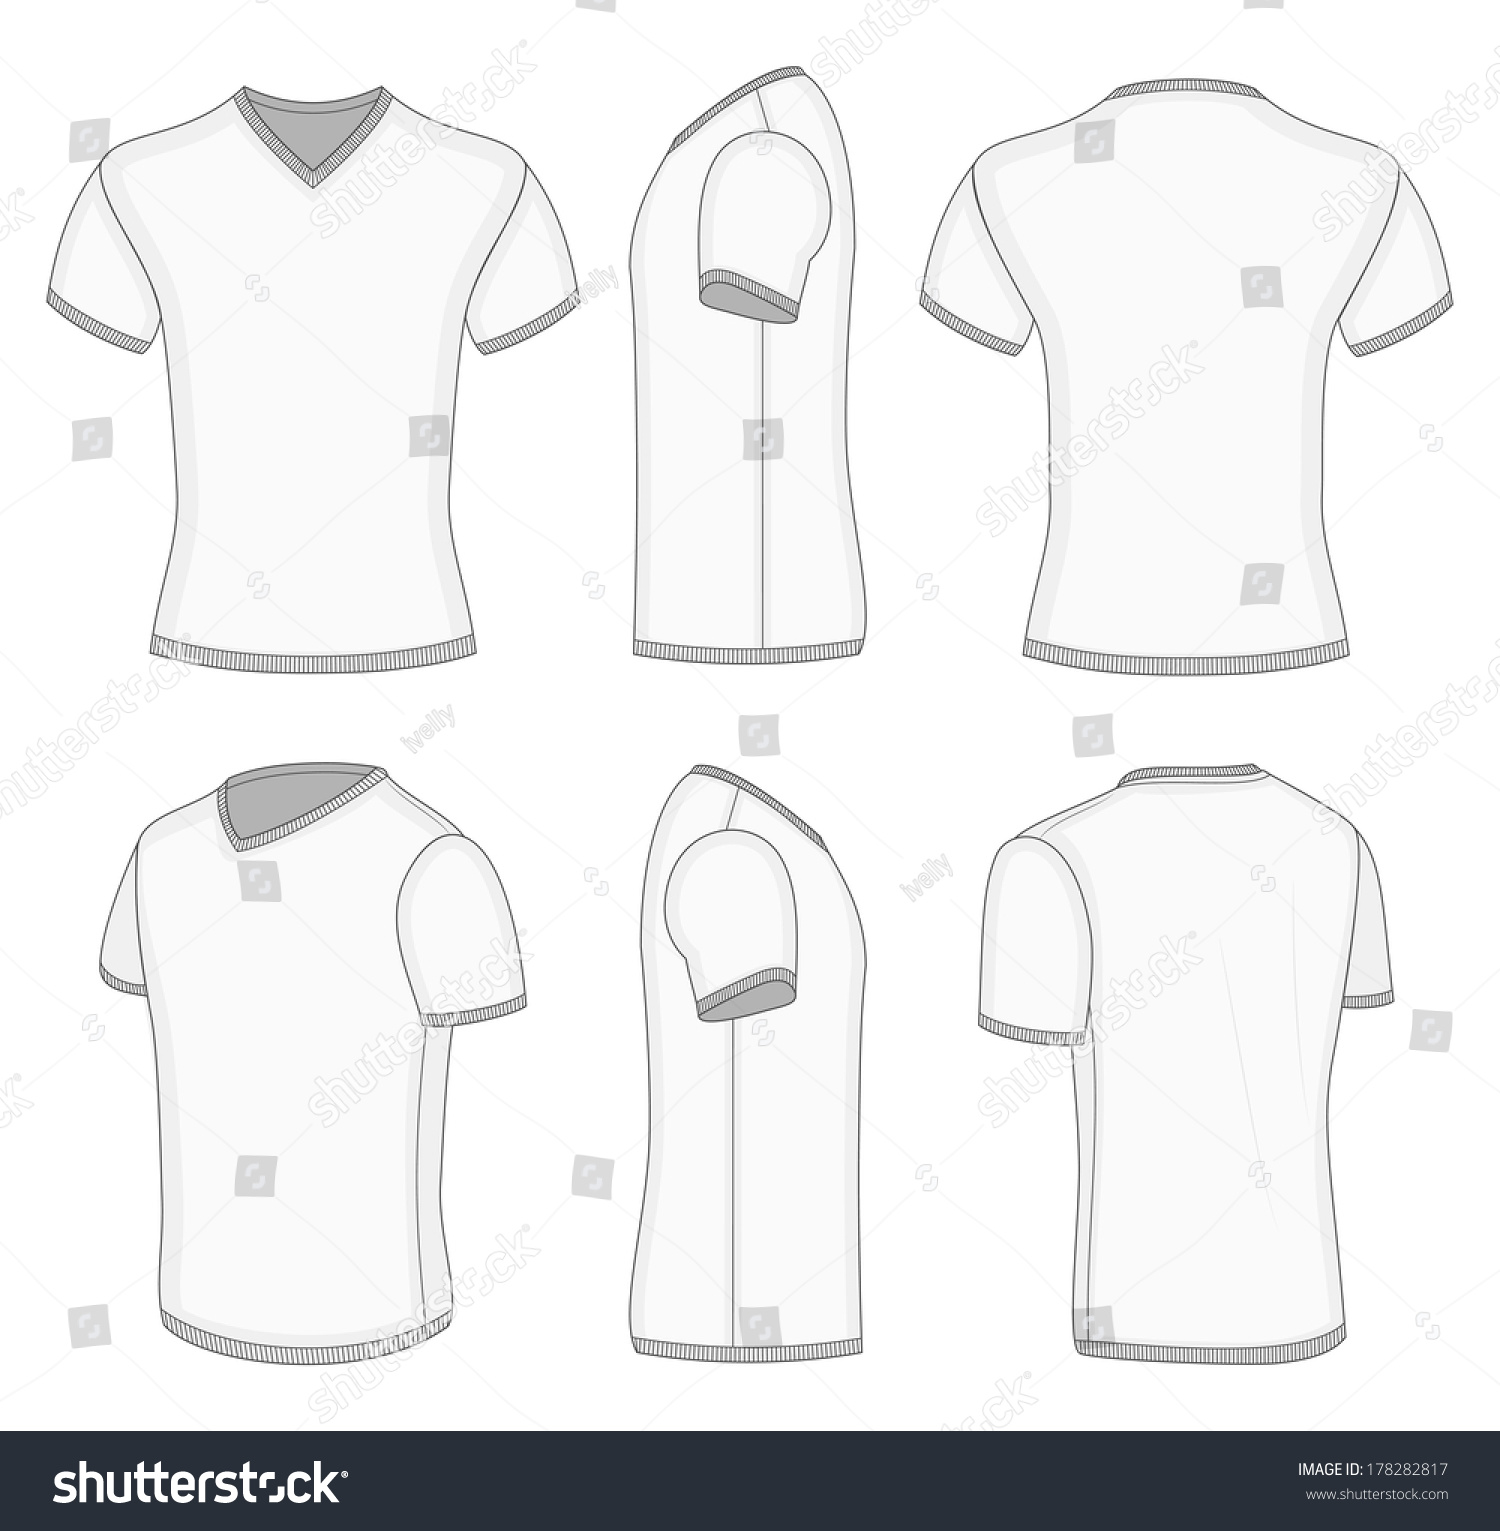 all views men 39 s white short sleeve t shirt v neck design templates vector illustration no mesh. Black Bedroom Furniture Sets. Home Design Ideas